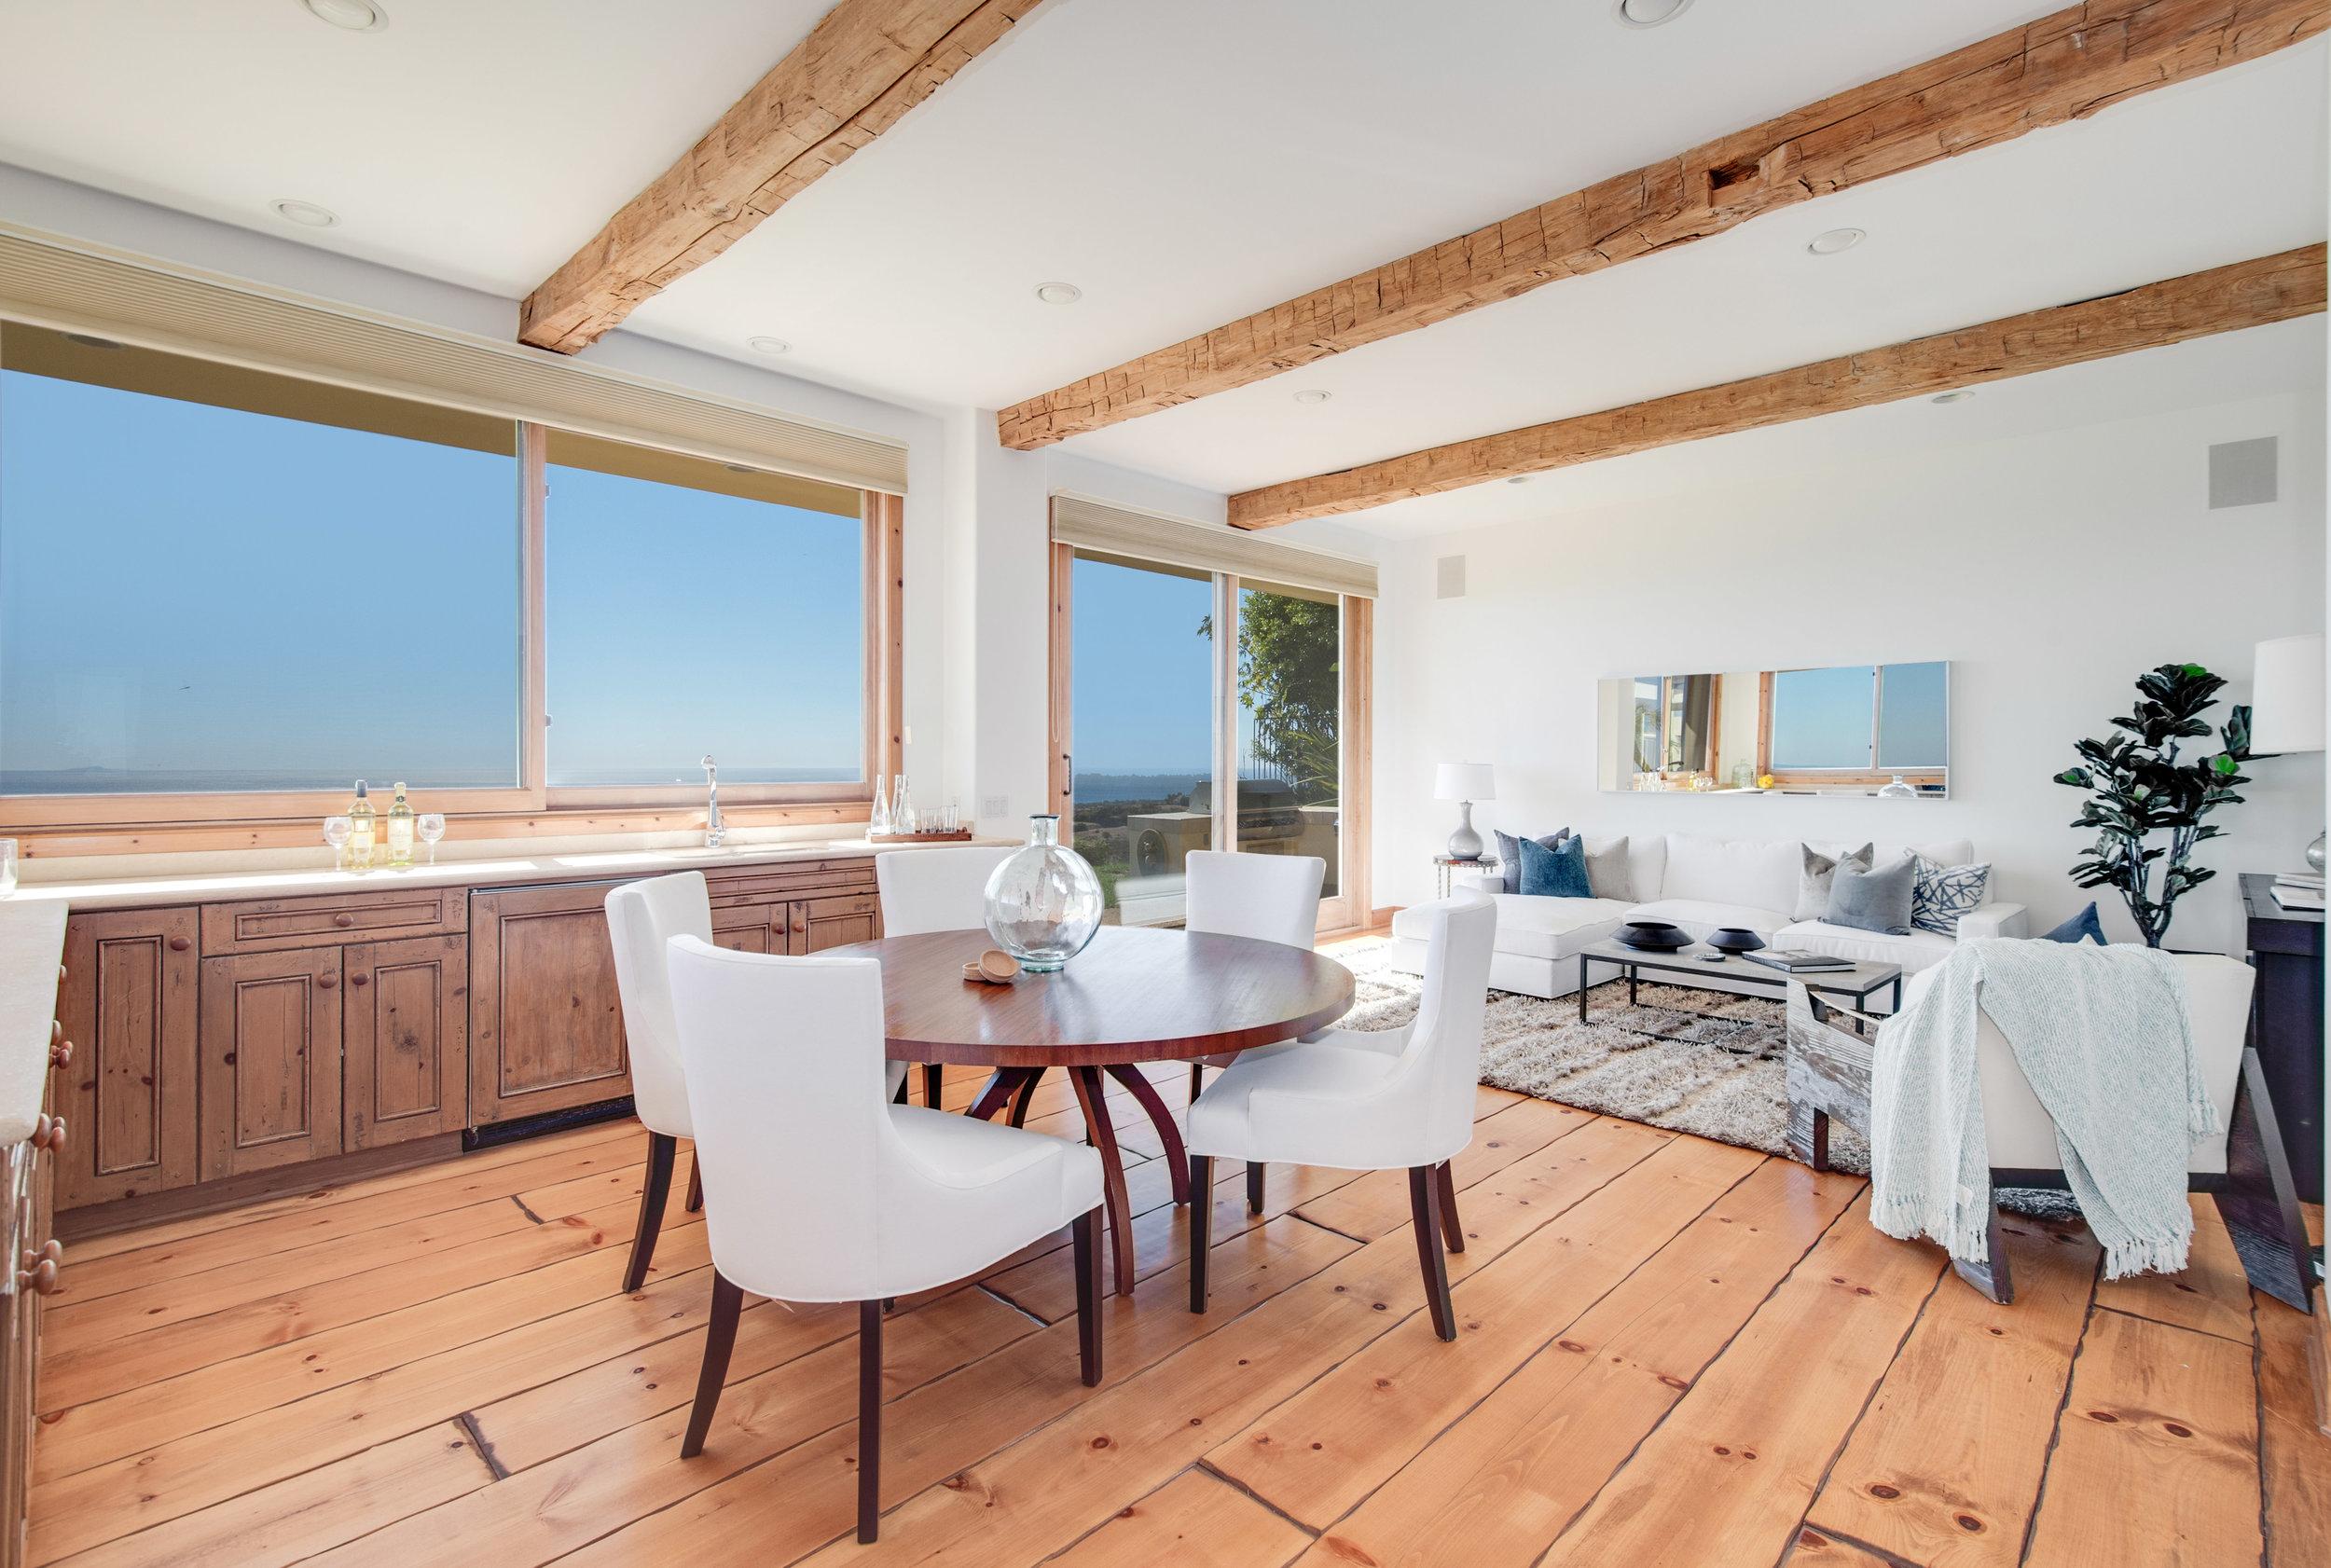 009 Living Room 27475 Latigo Bay View Drive For Sale Lease The Malibu Life Team Luxury Real Estate.jpg